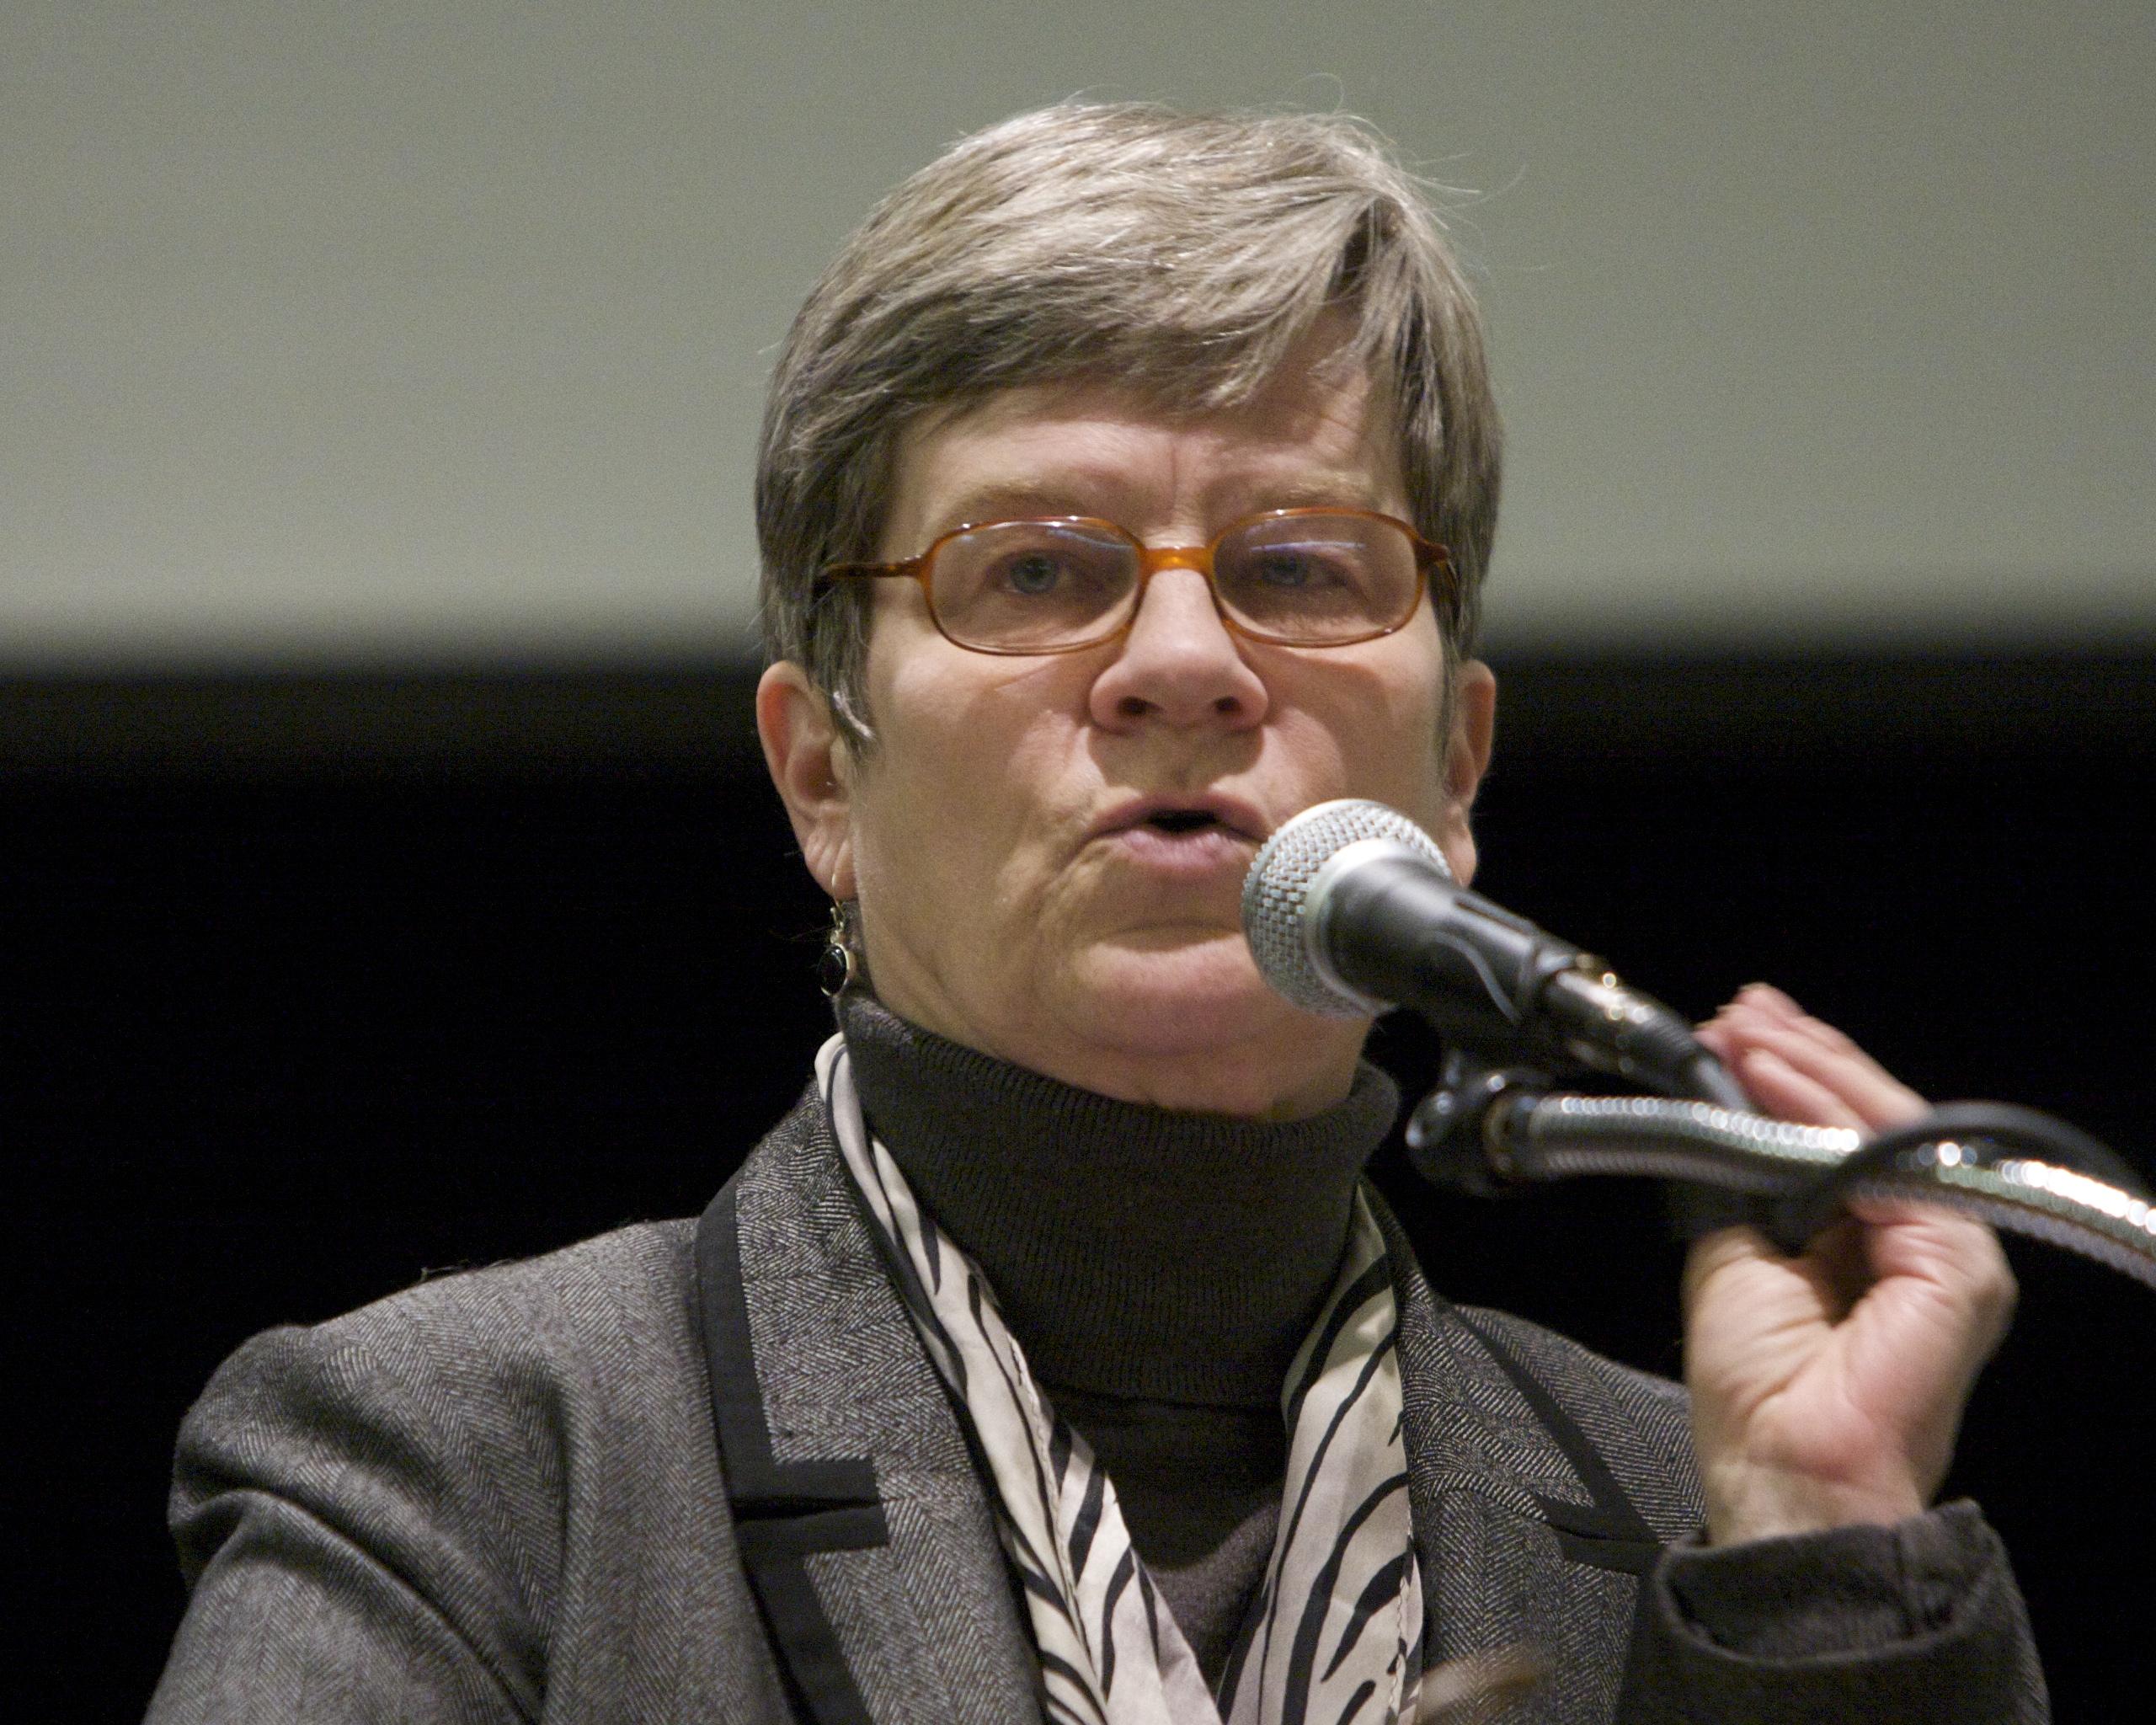 image of Kathleen Hall Jamieson